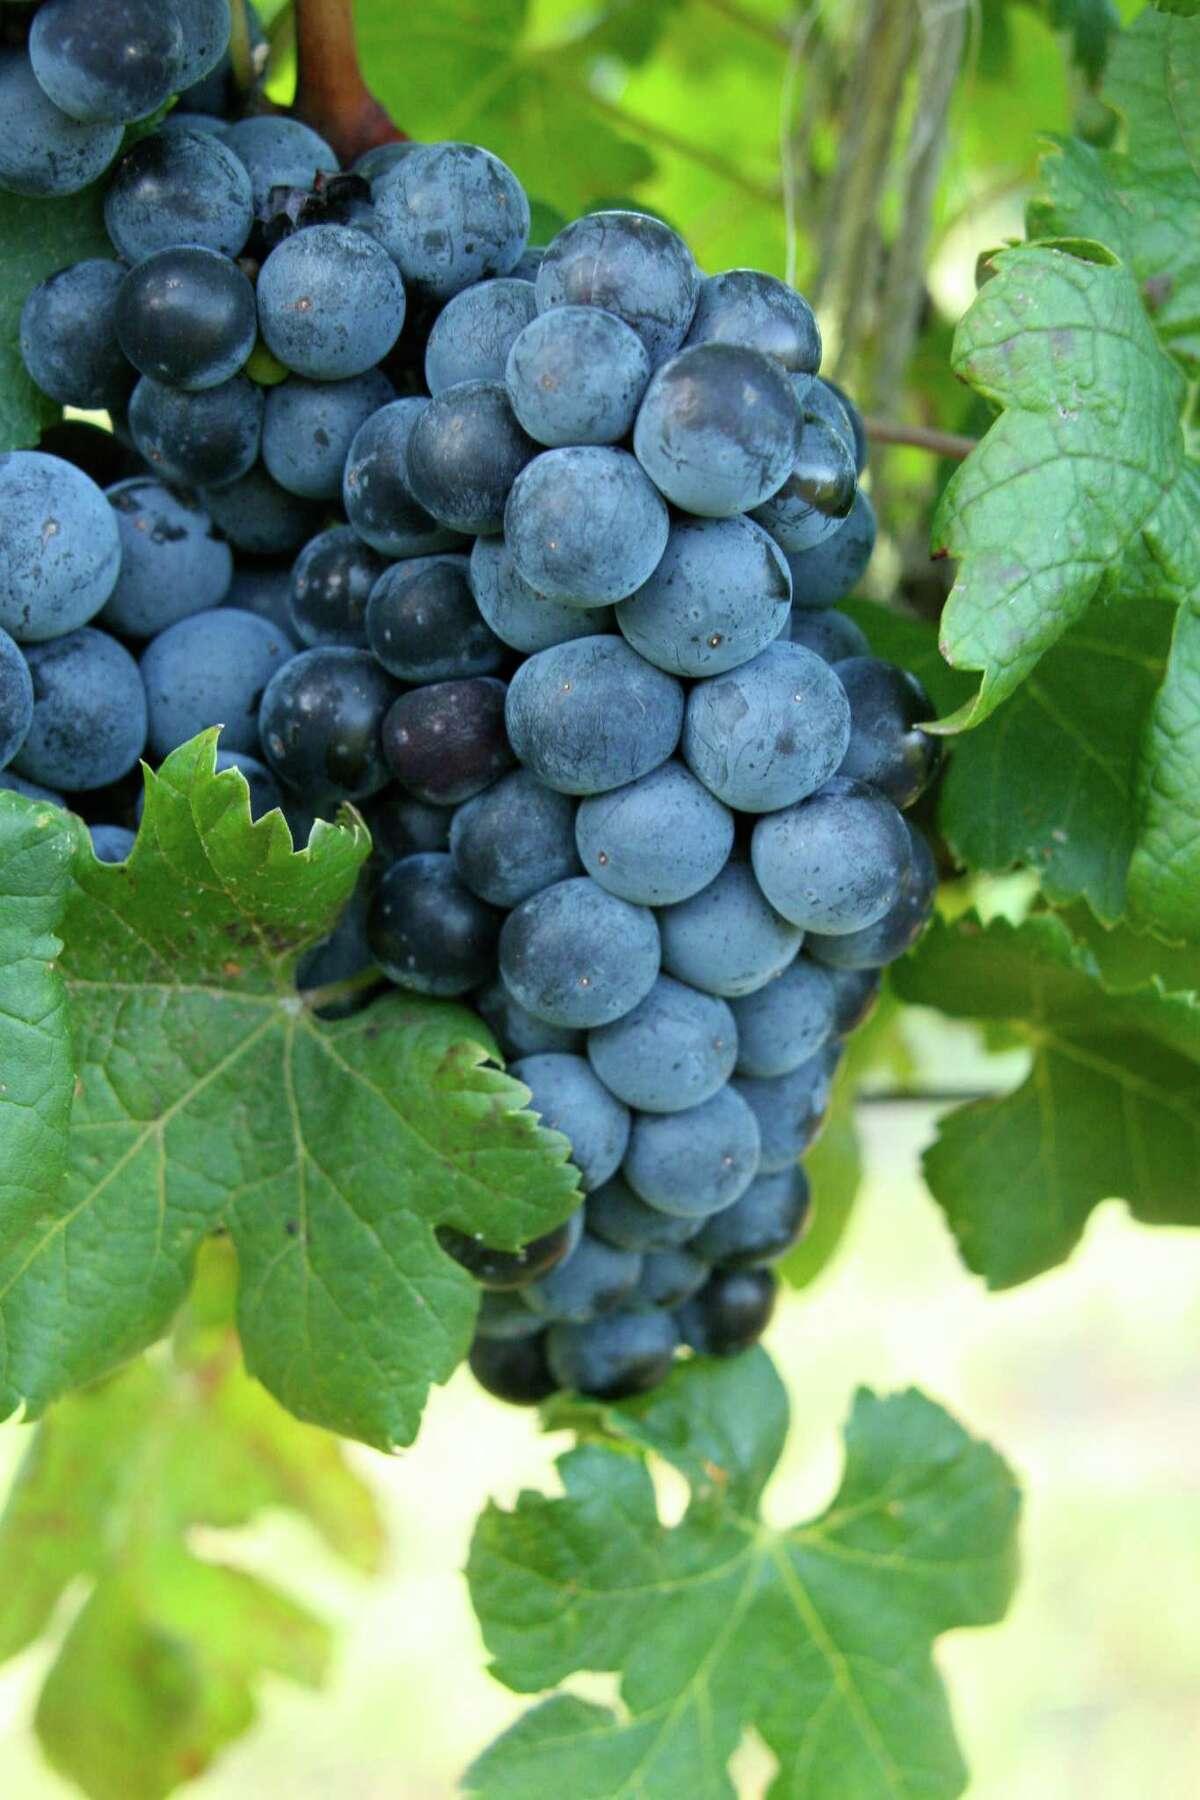 Grapes on the vine at Pedernales Cellars.